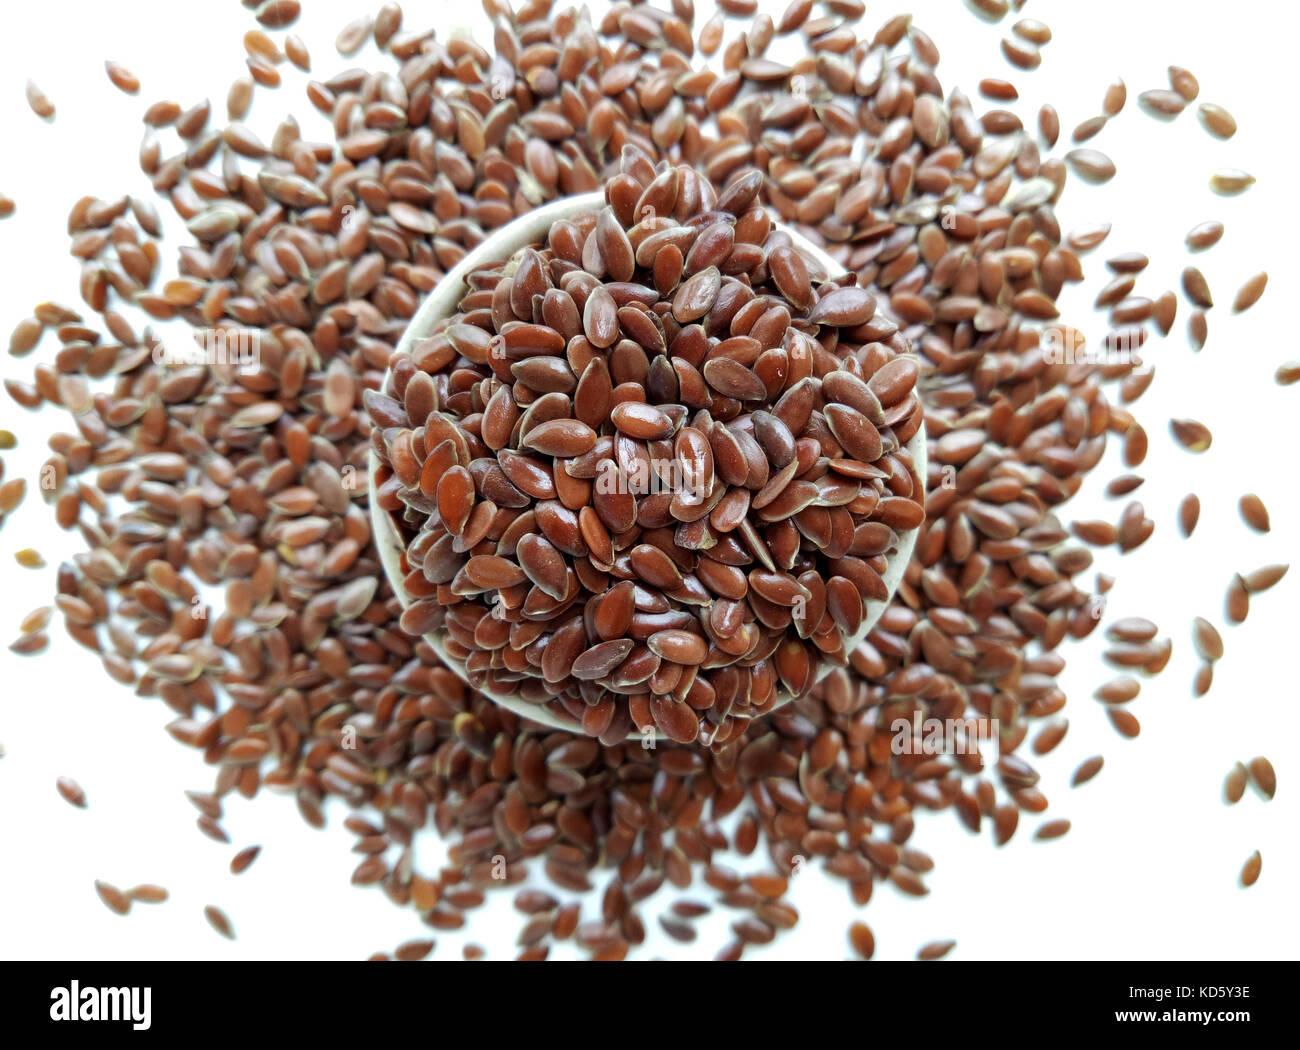 Flax Seeds - Stock Image